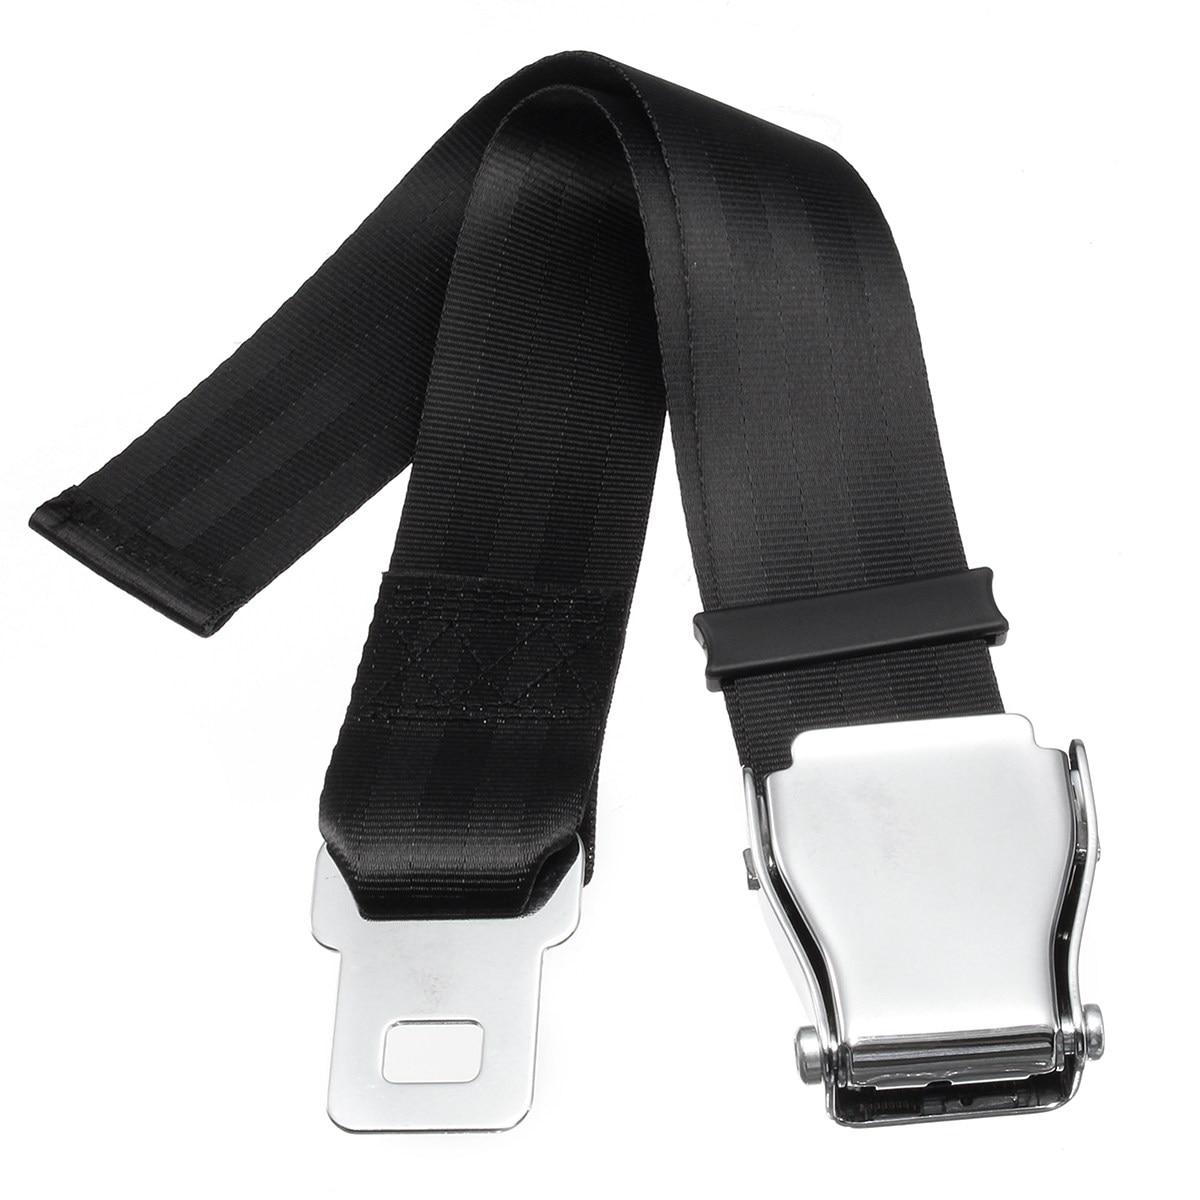 Universal Adjustable Aircraft Airplane Safe Seat Belt Extension Extender Buckle Safebelt Extender